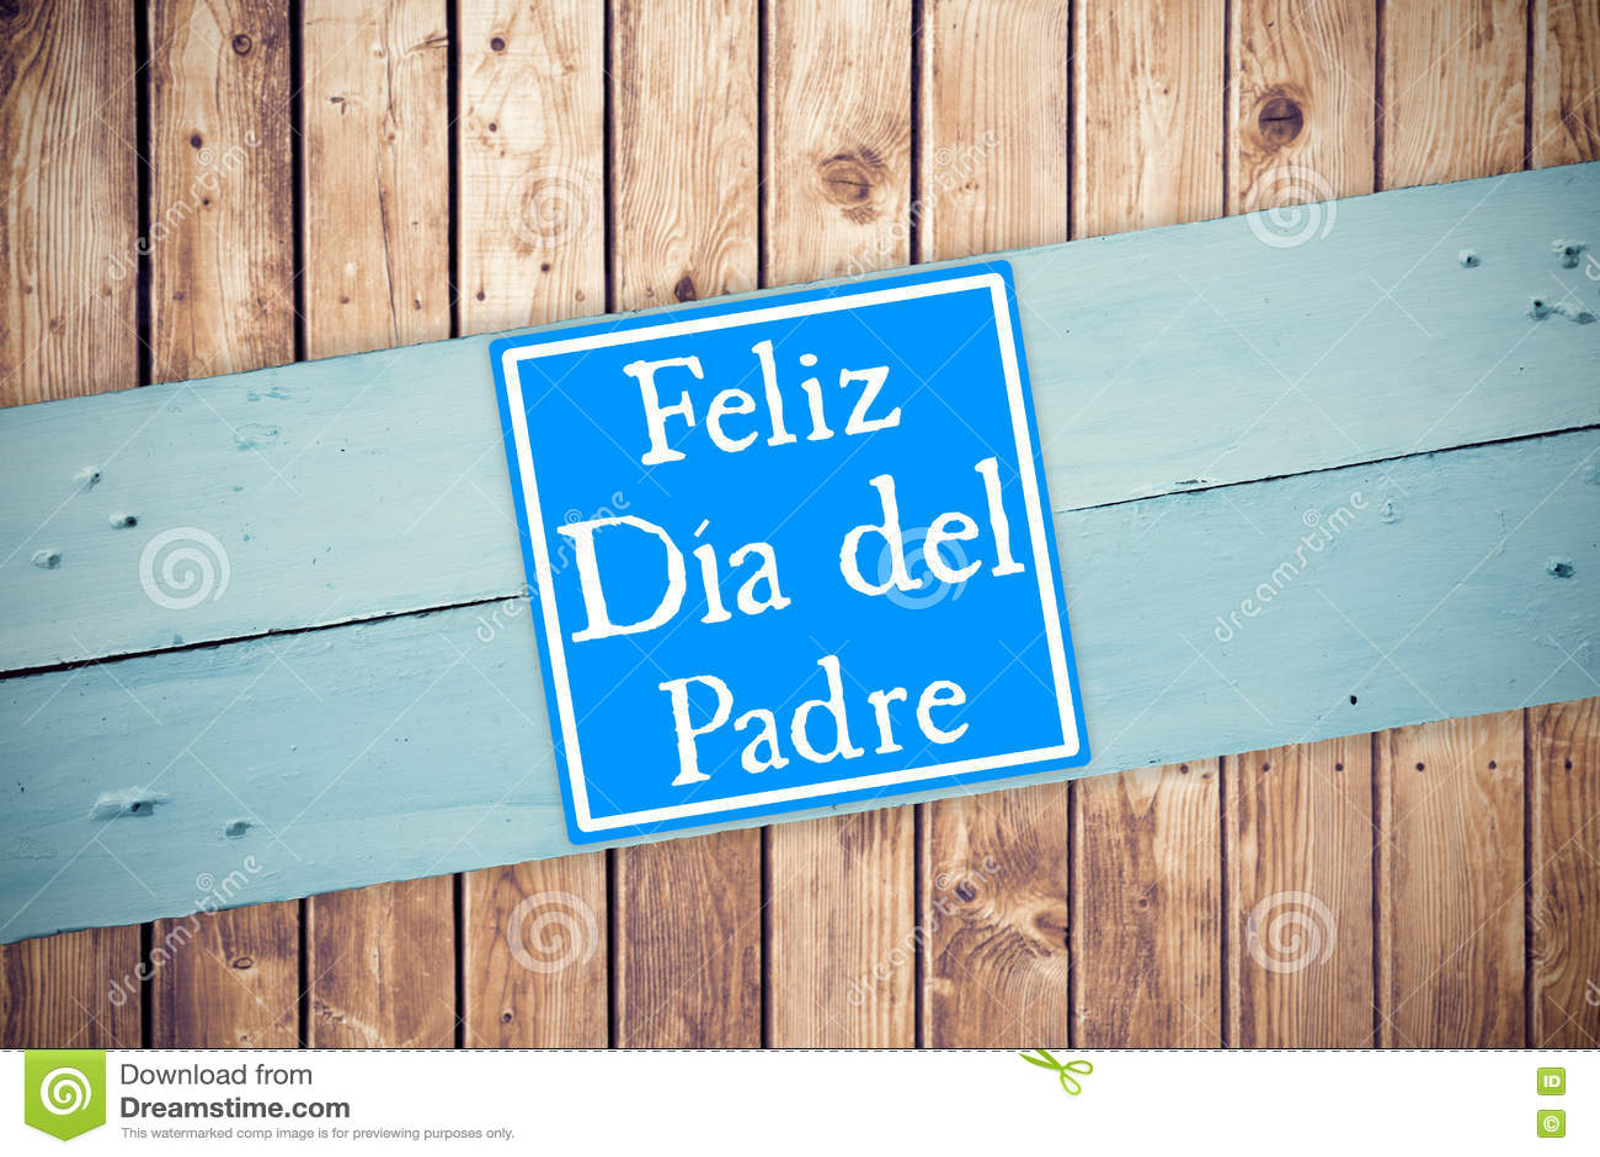 Samengesteld beeld van woord feliz dia del padre